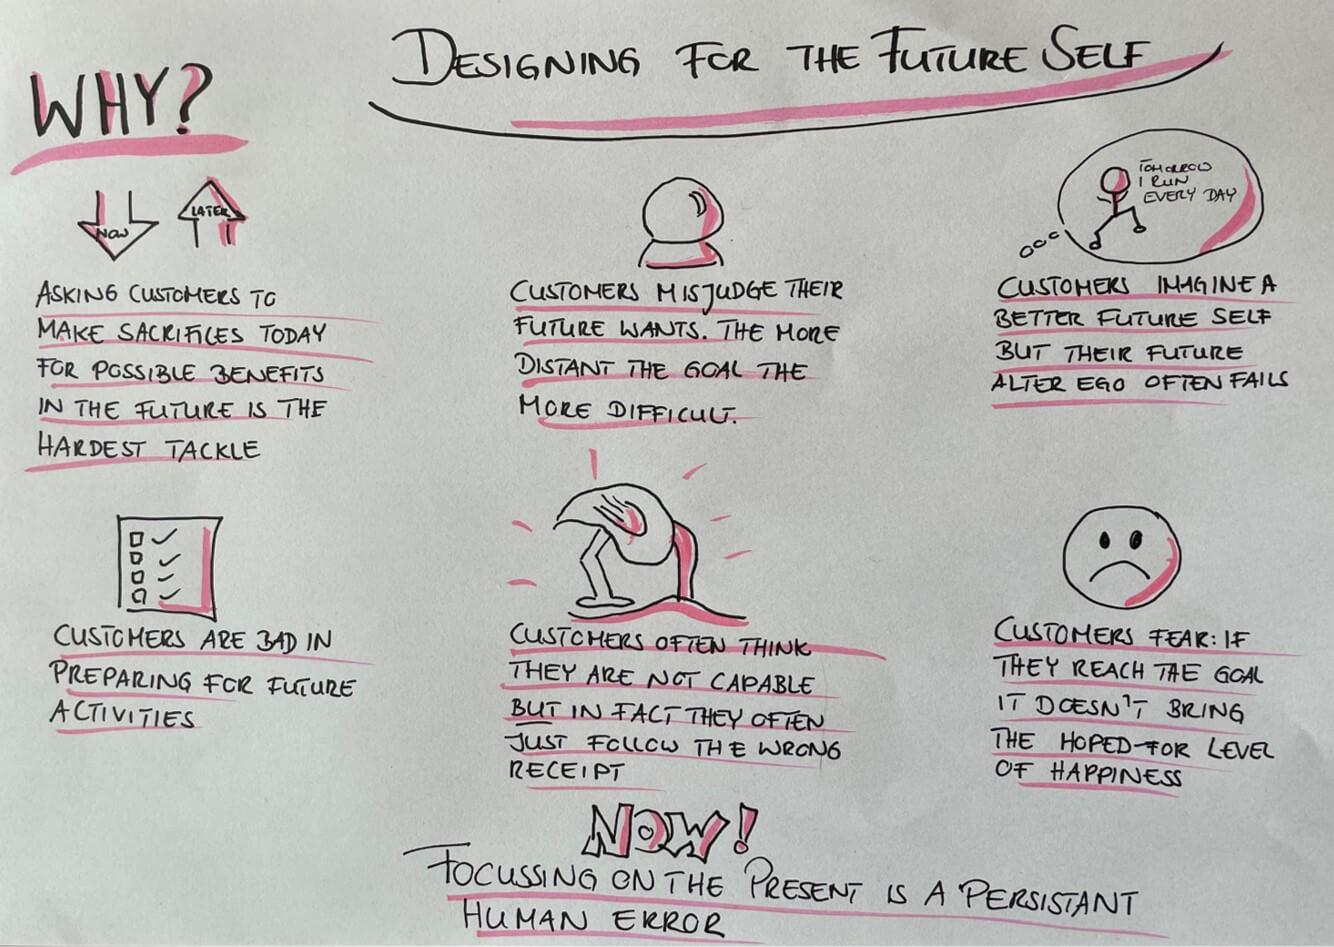 How to Design for Behavior Change: Future Self